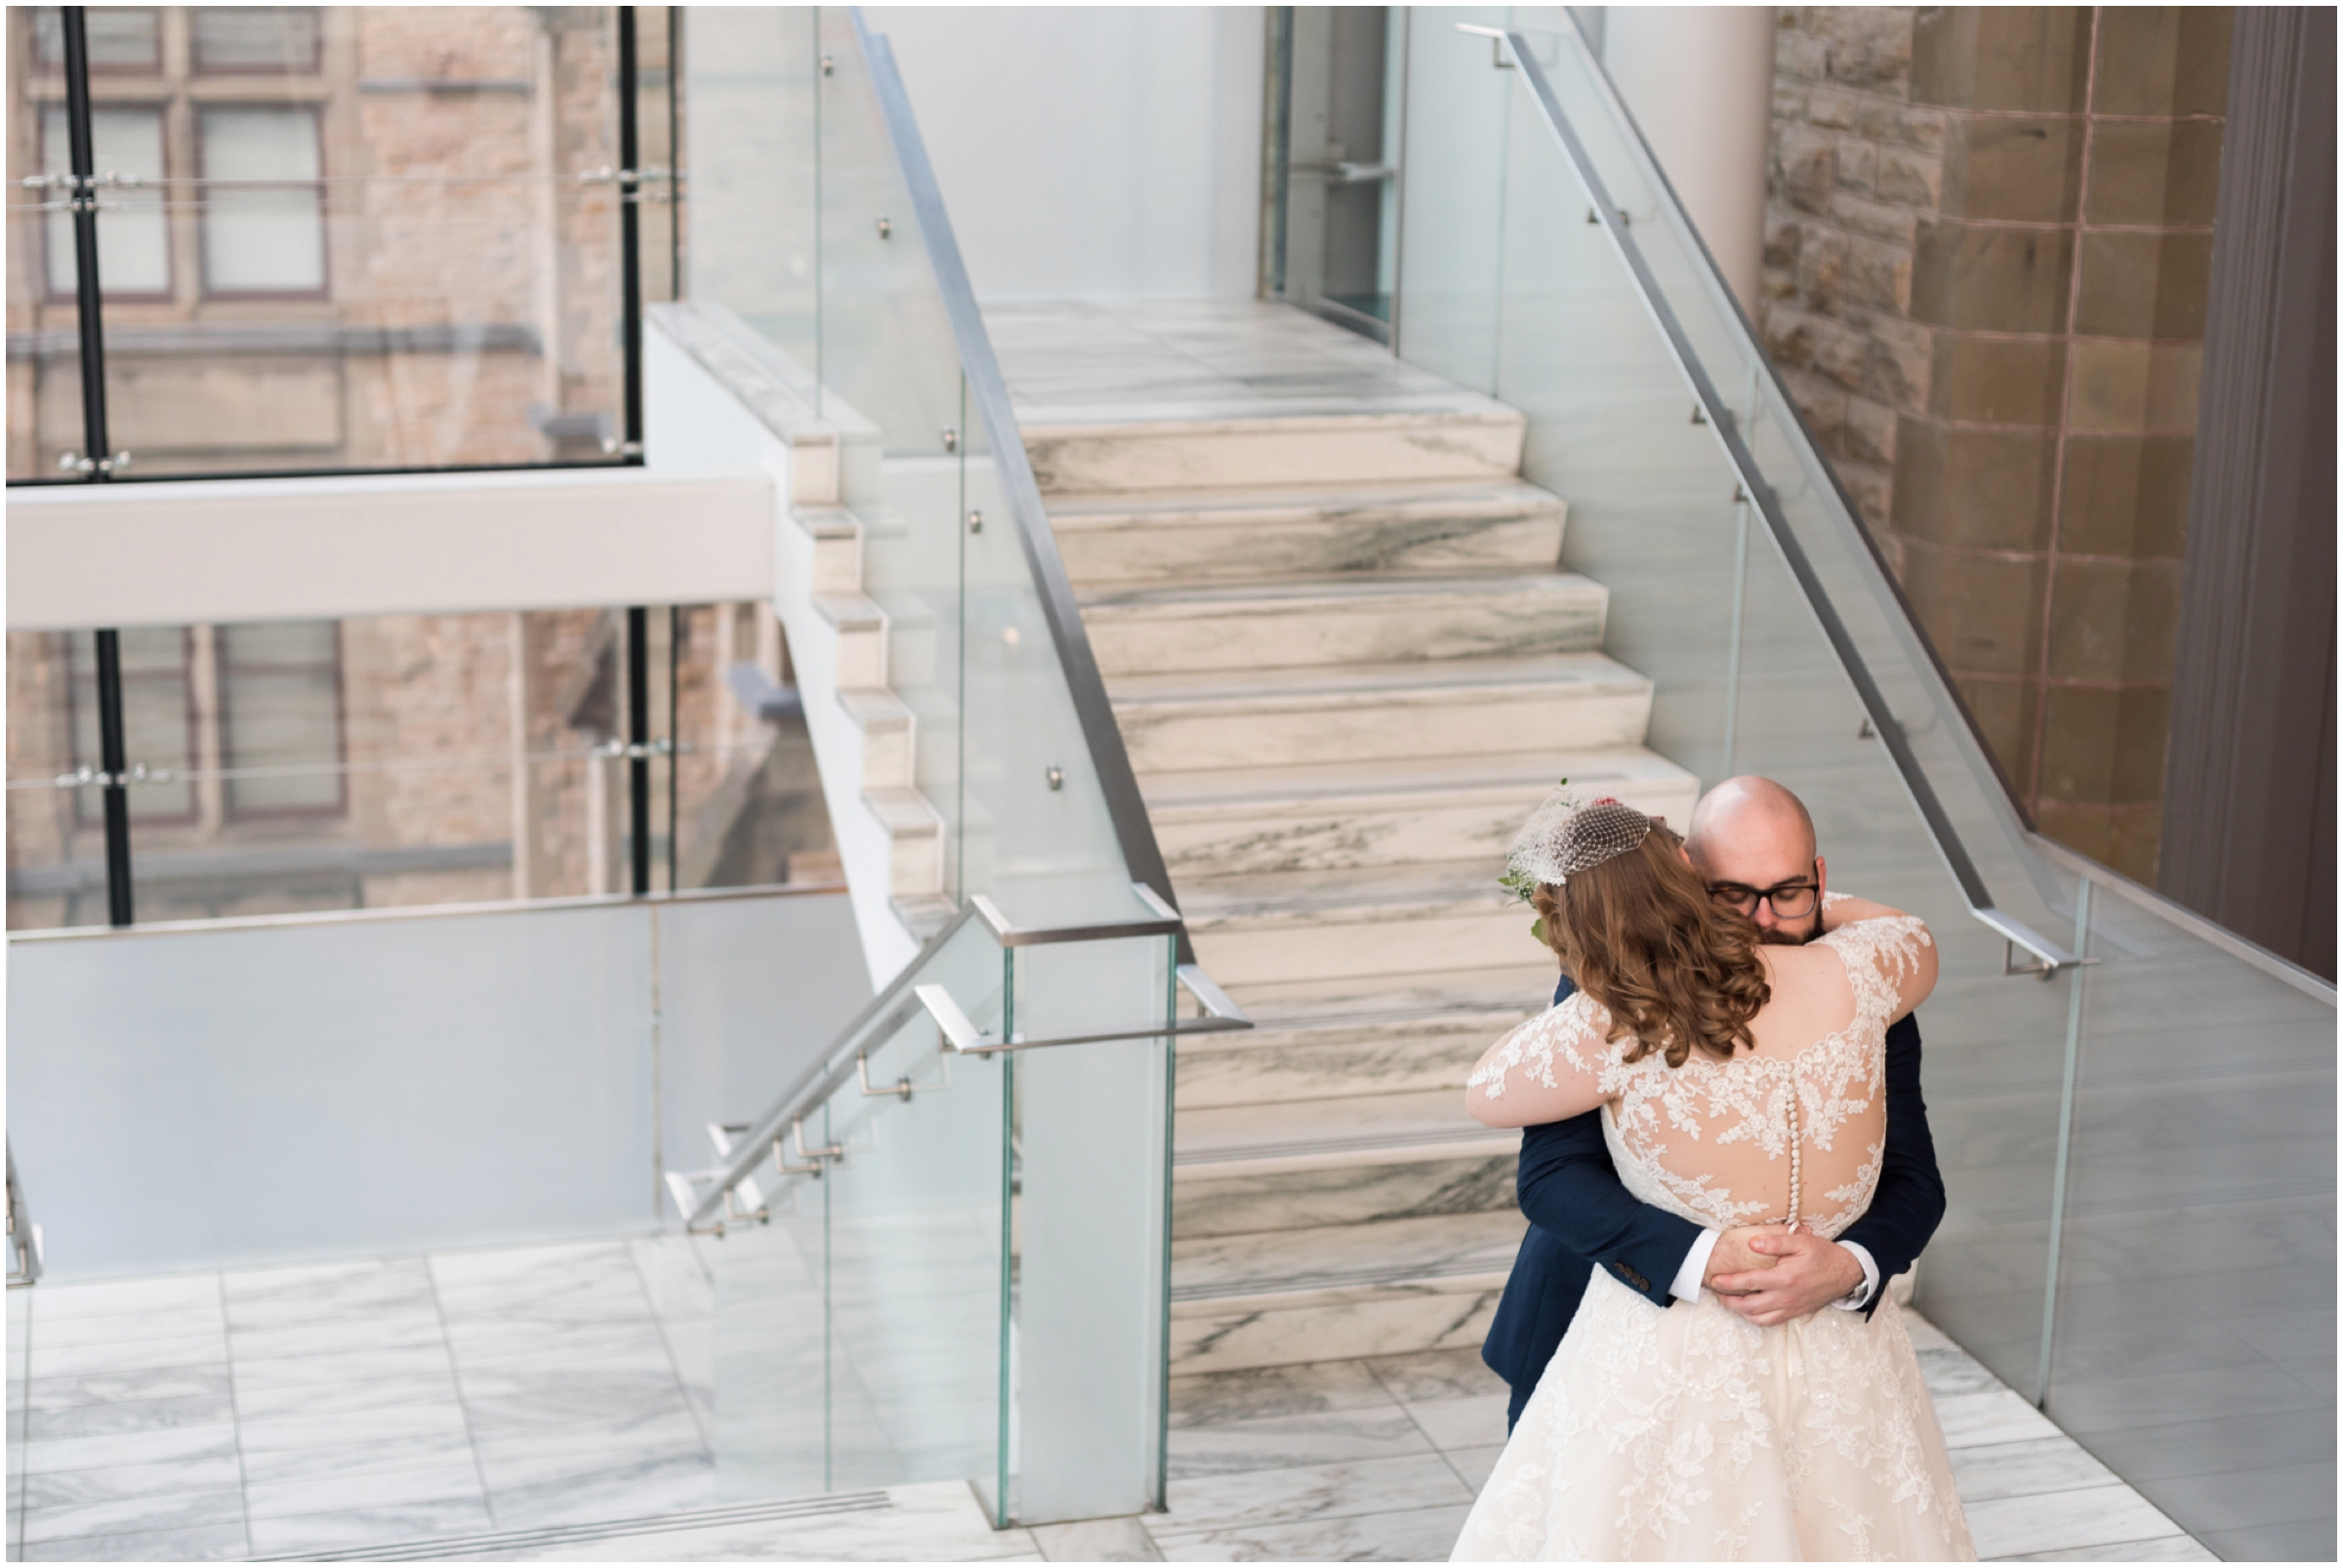 Ottaw Wedding Allison Andrew - (Selena Phillips-Boyle)_0065.jpg